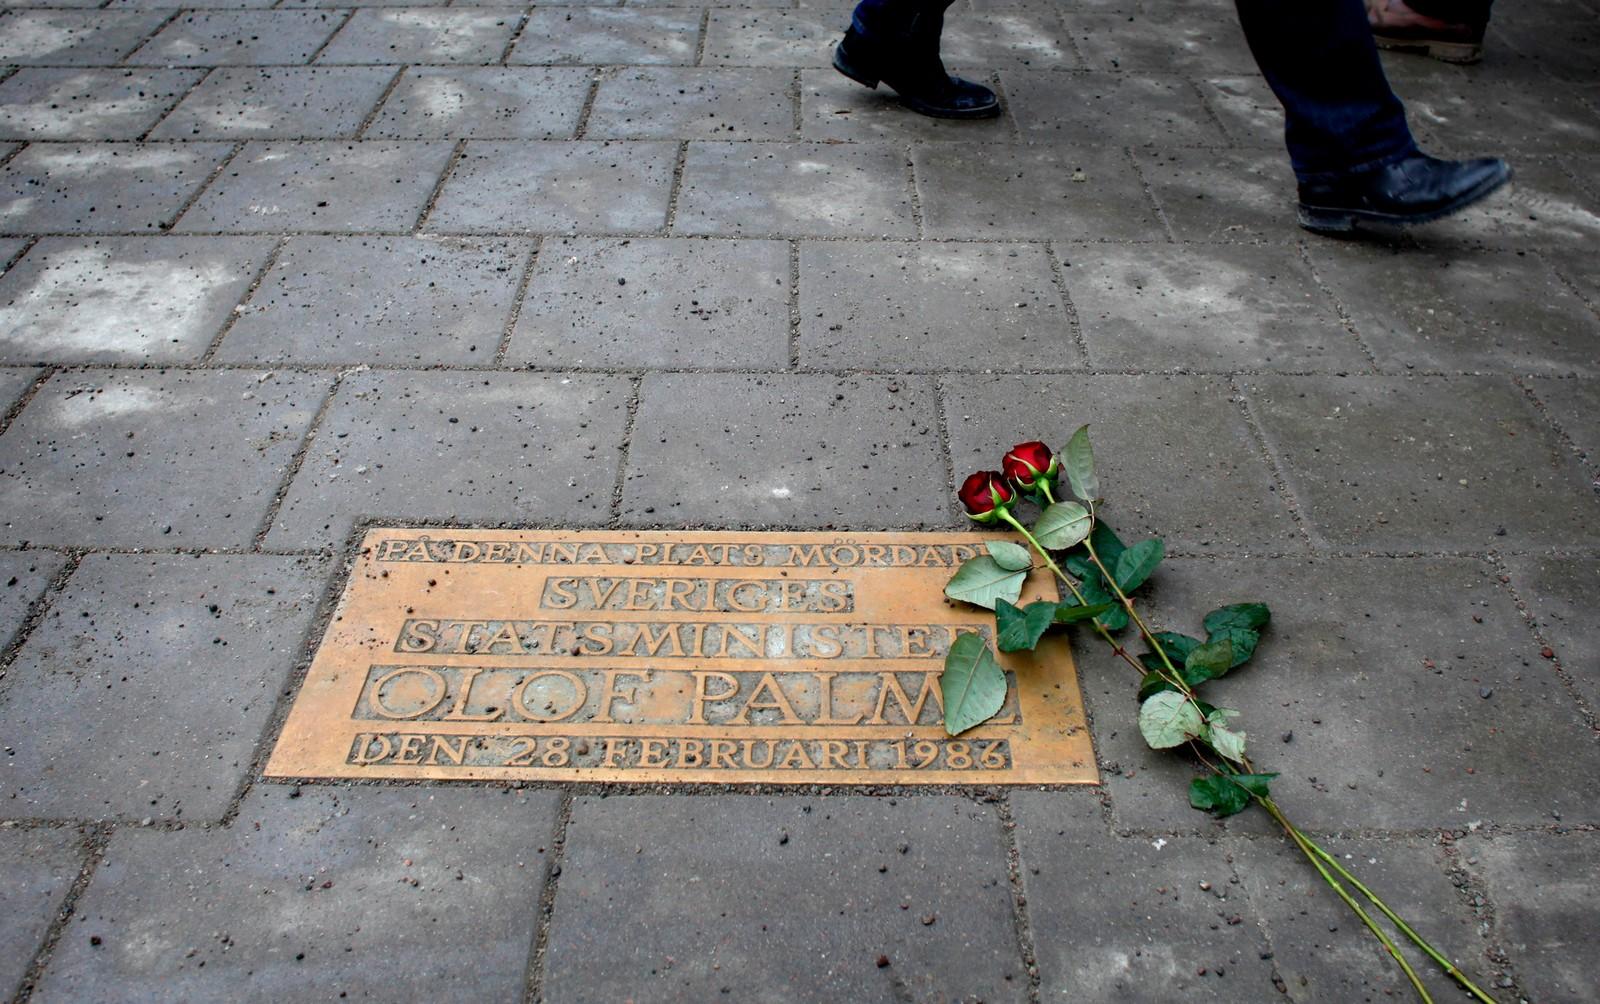 En plakett i asfalten markerer åstedet der Palme ble drept.